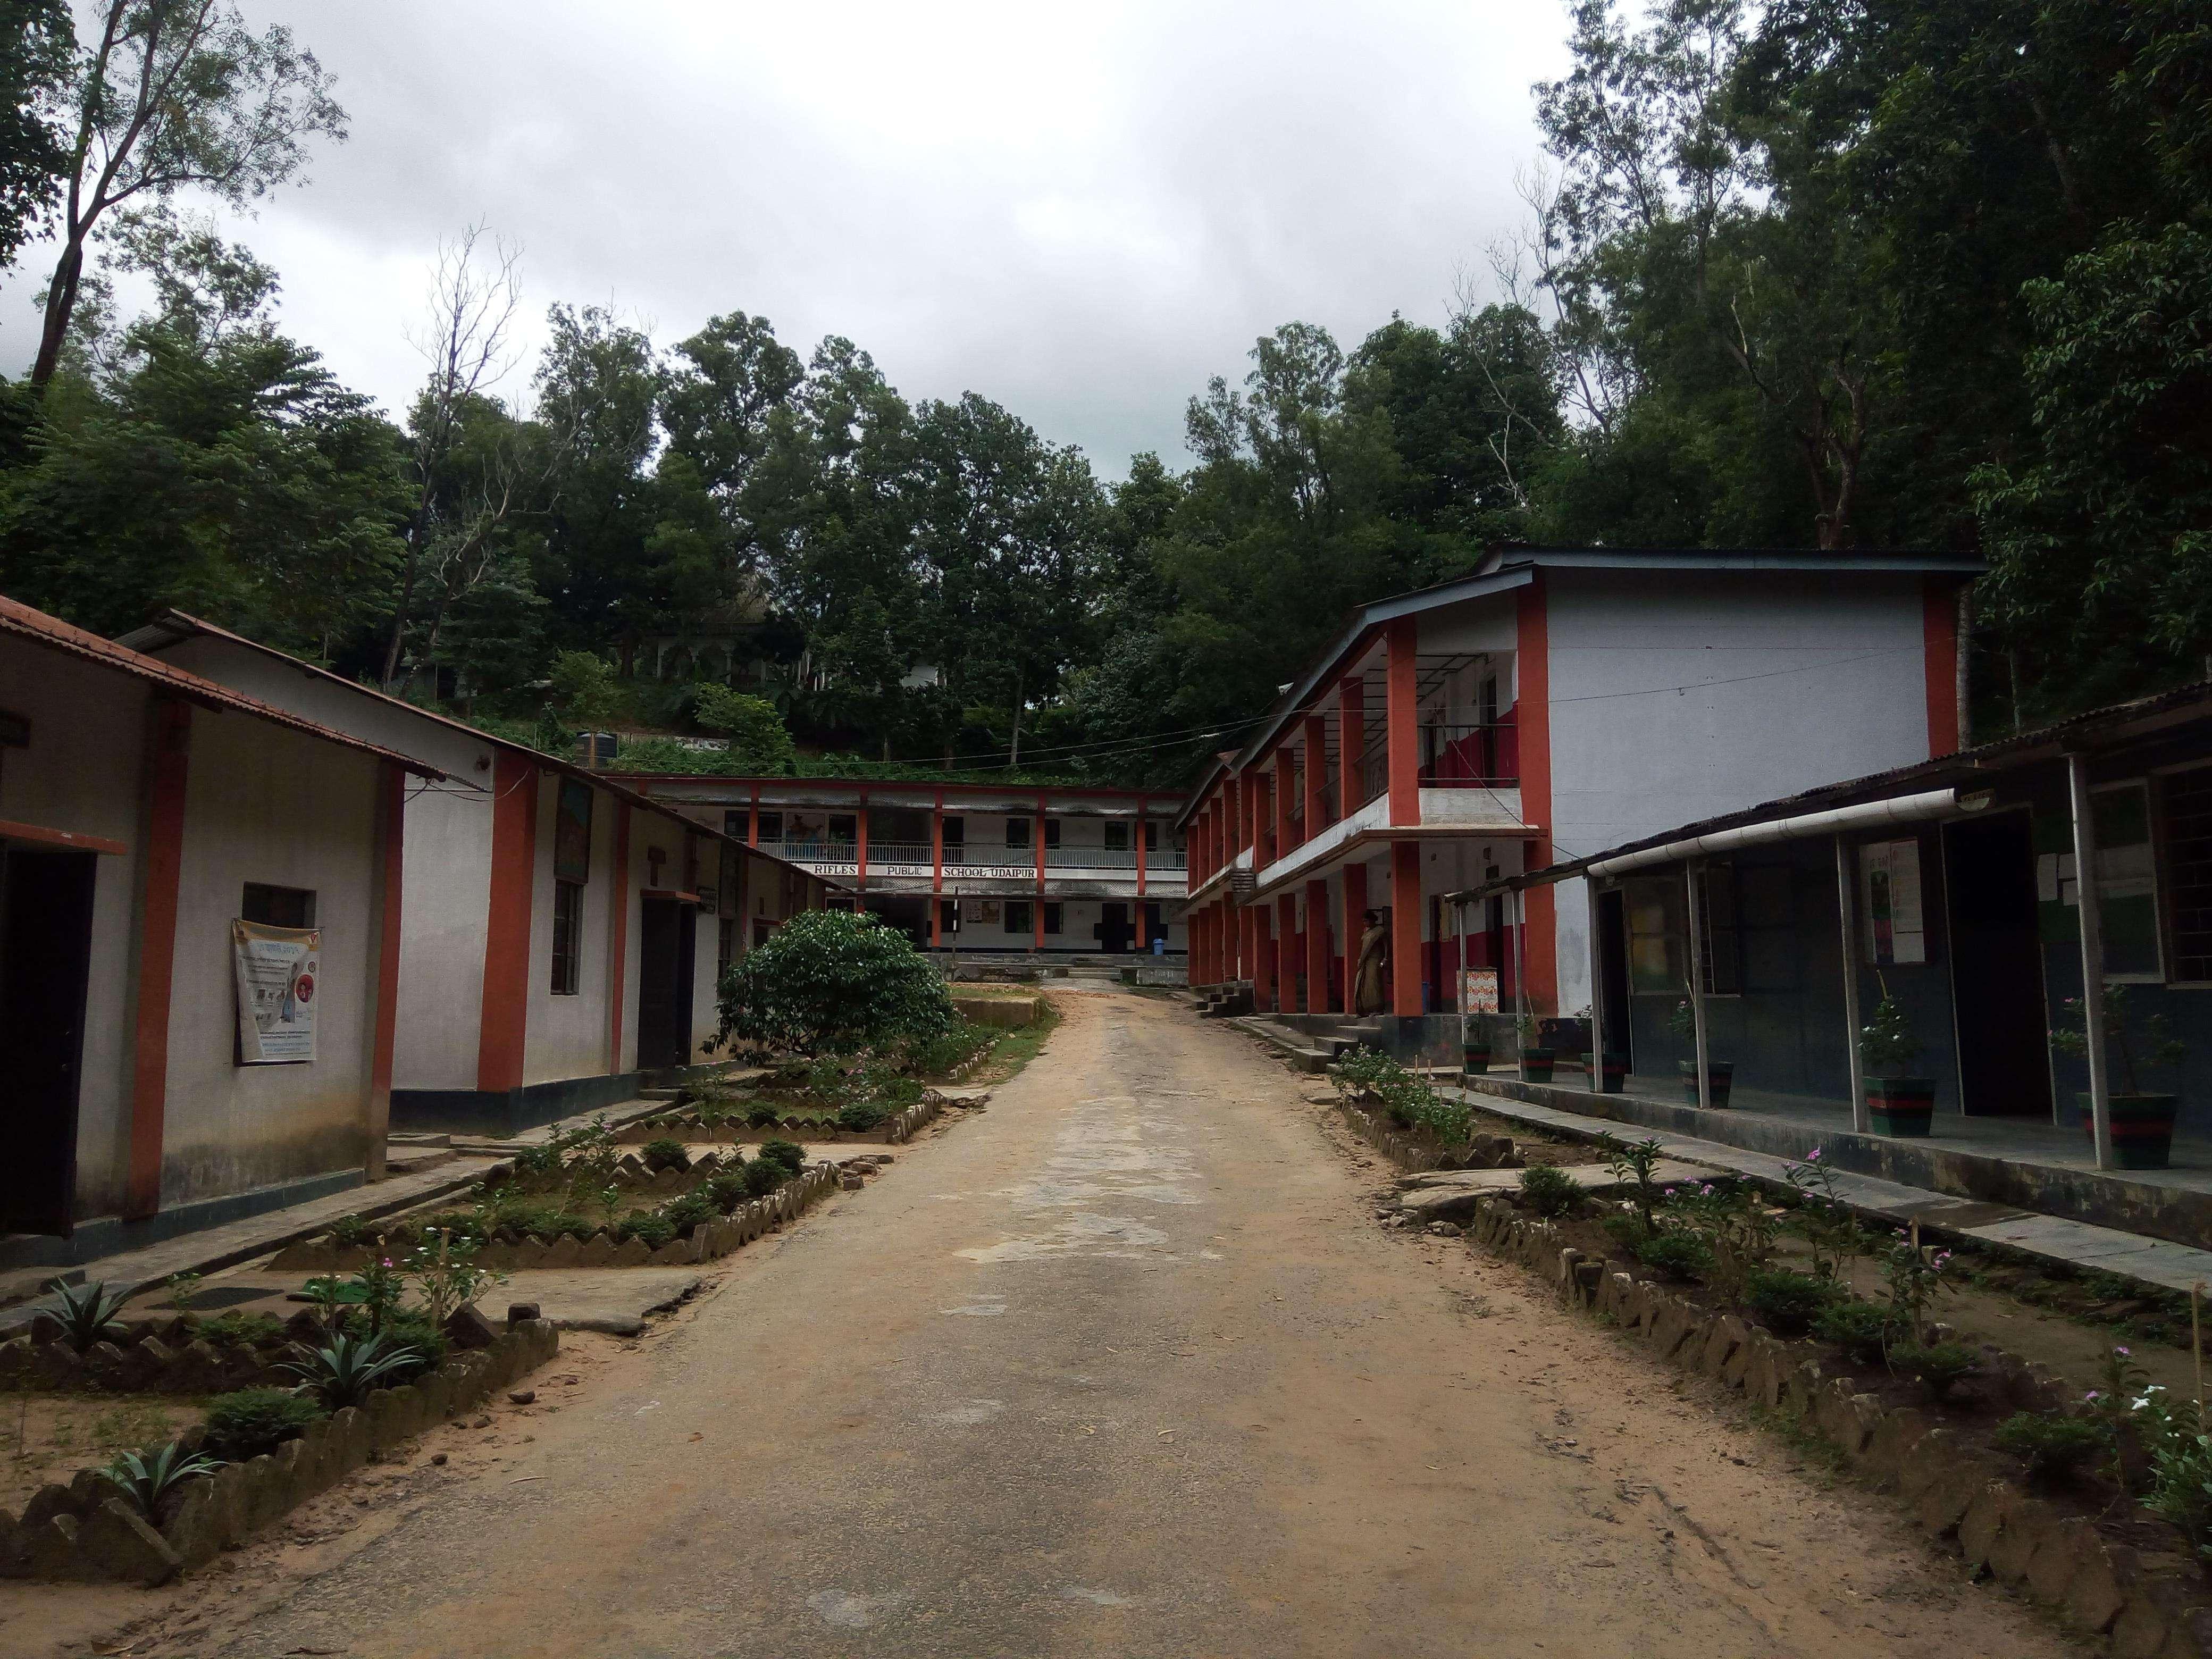 ASSAM RIFLES SCHOOL UDAIPUR SOUTH TRIPURA C O 6 ASSAM RIFLES 99 APO 2030008